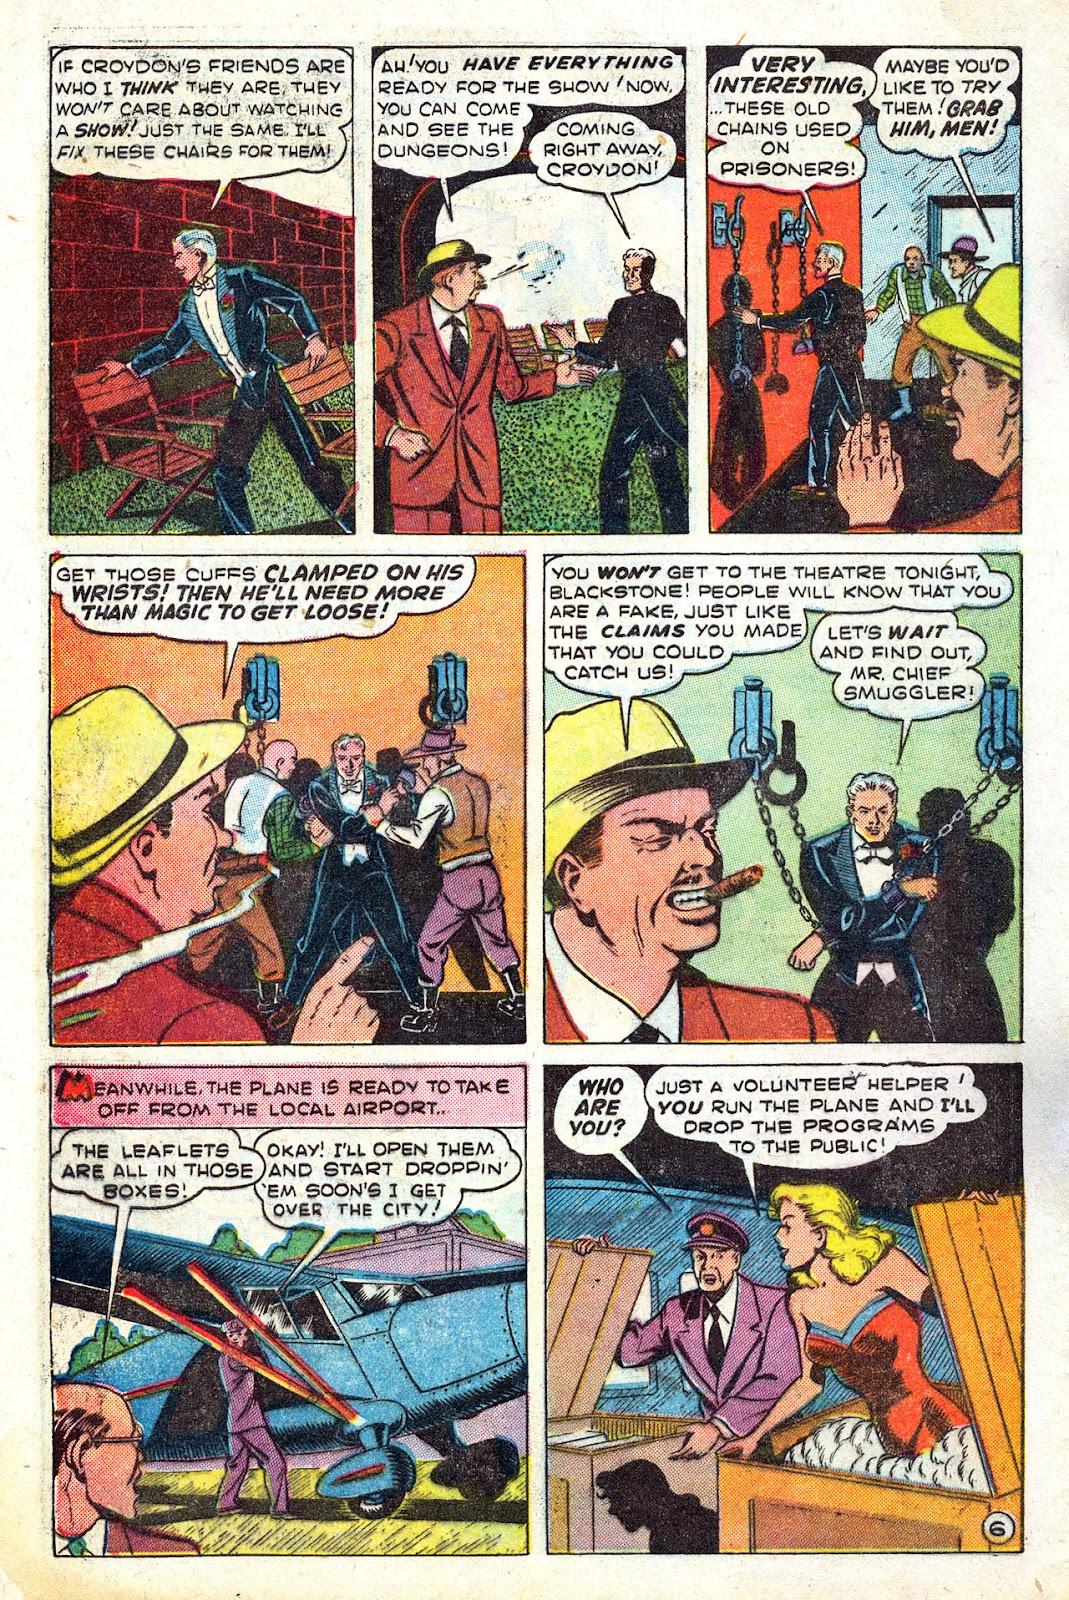 Read online Blackstone the Magician comic -  Issue #4 - 8